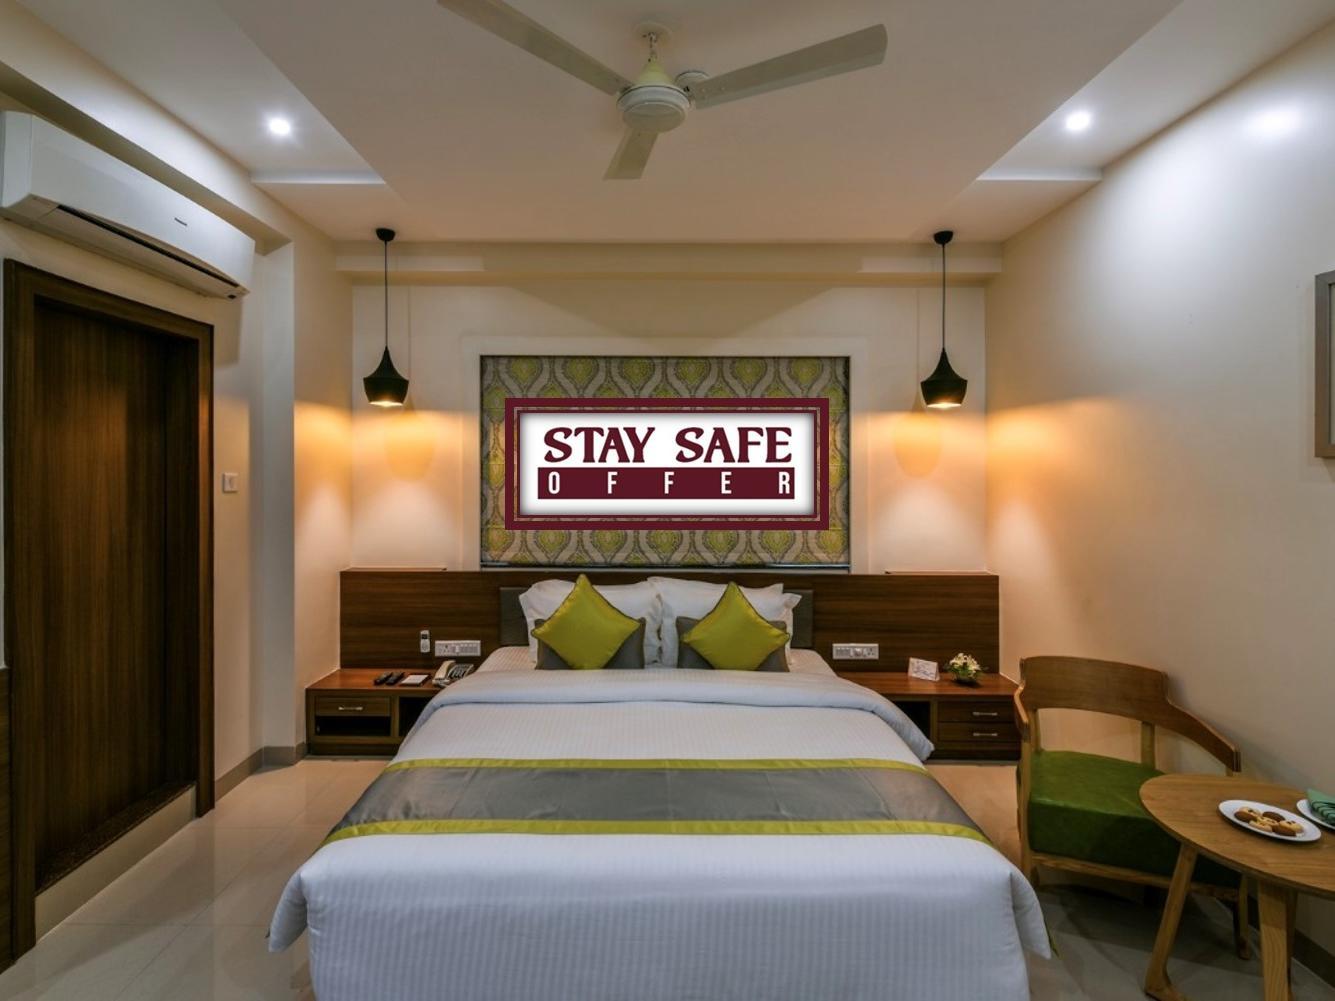 Stay Safe Offer  - Eastin Hotel